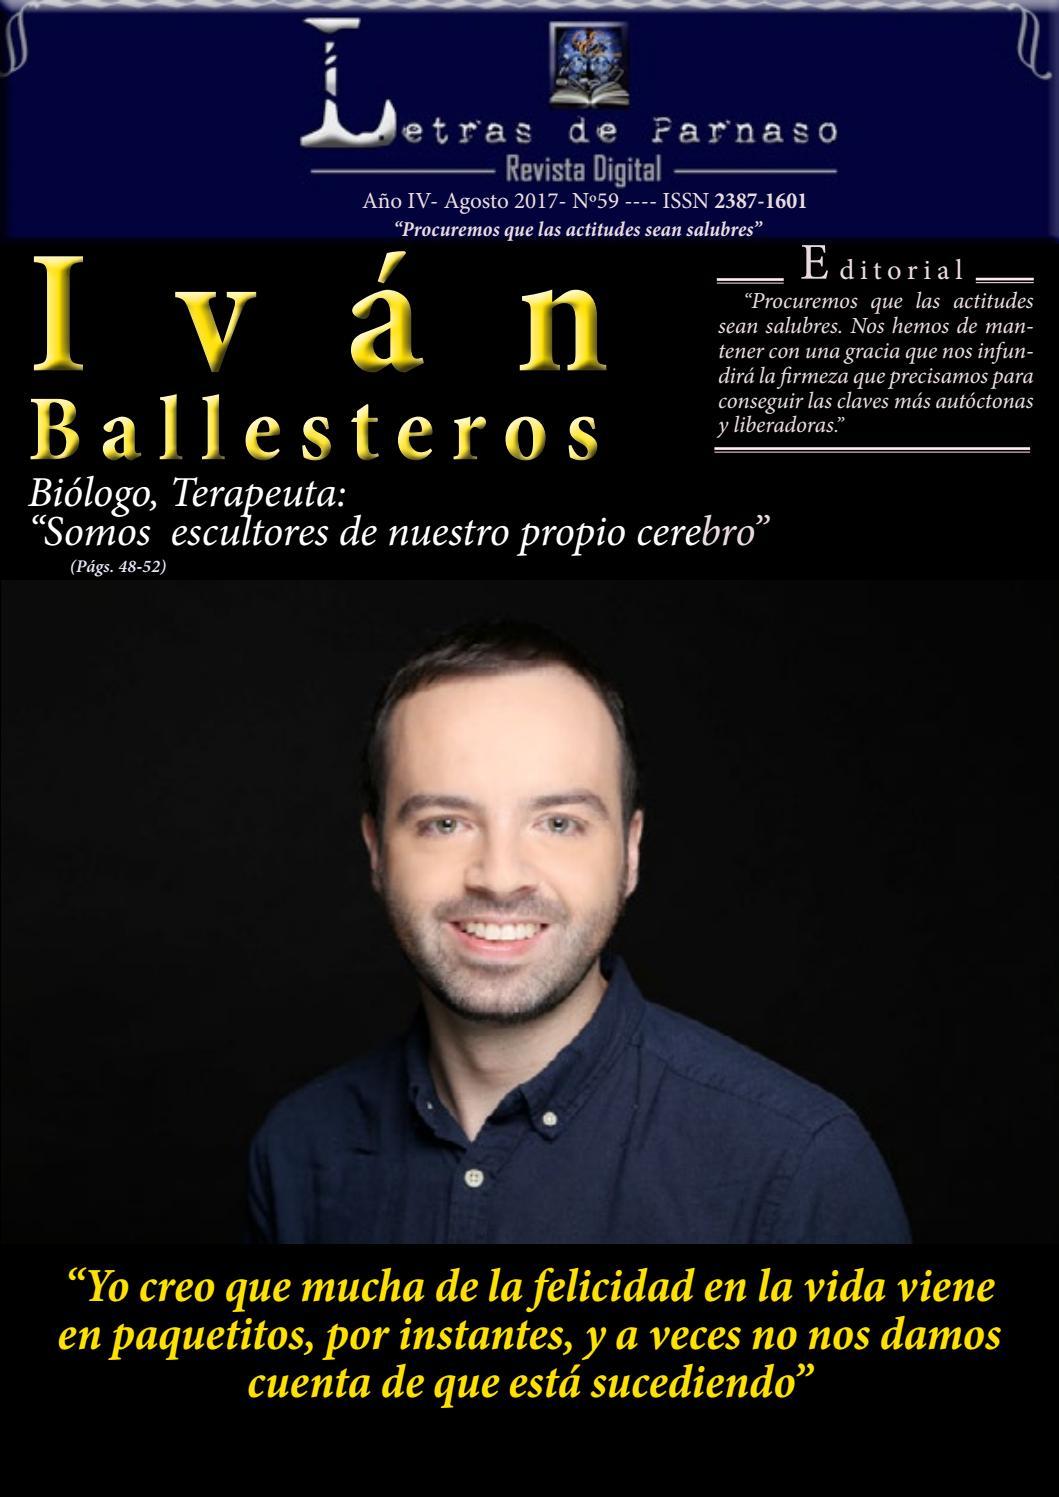 71e234a23c40 Edicion59 by Juan Antonio Pellicer - issuu